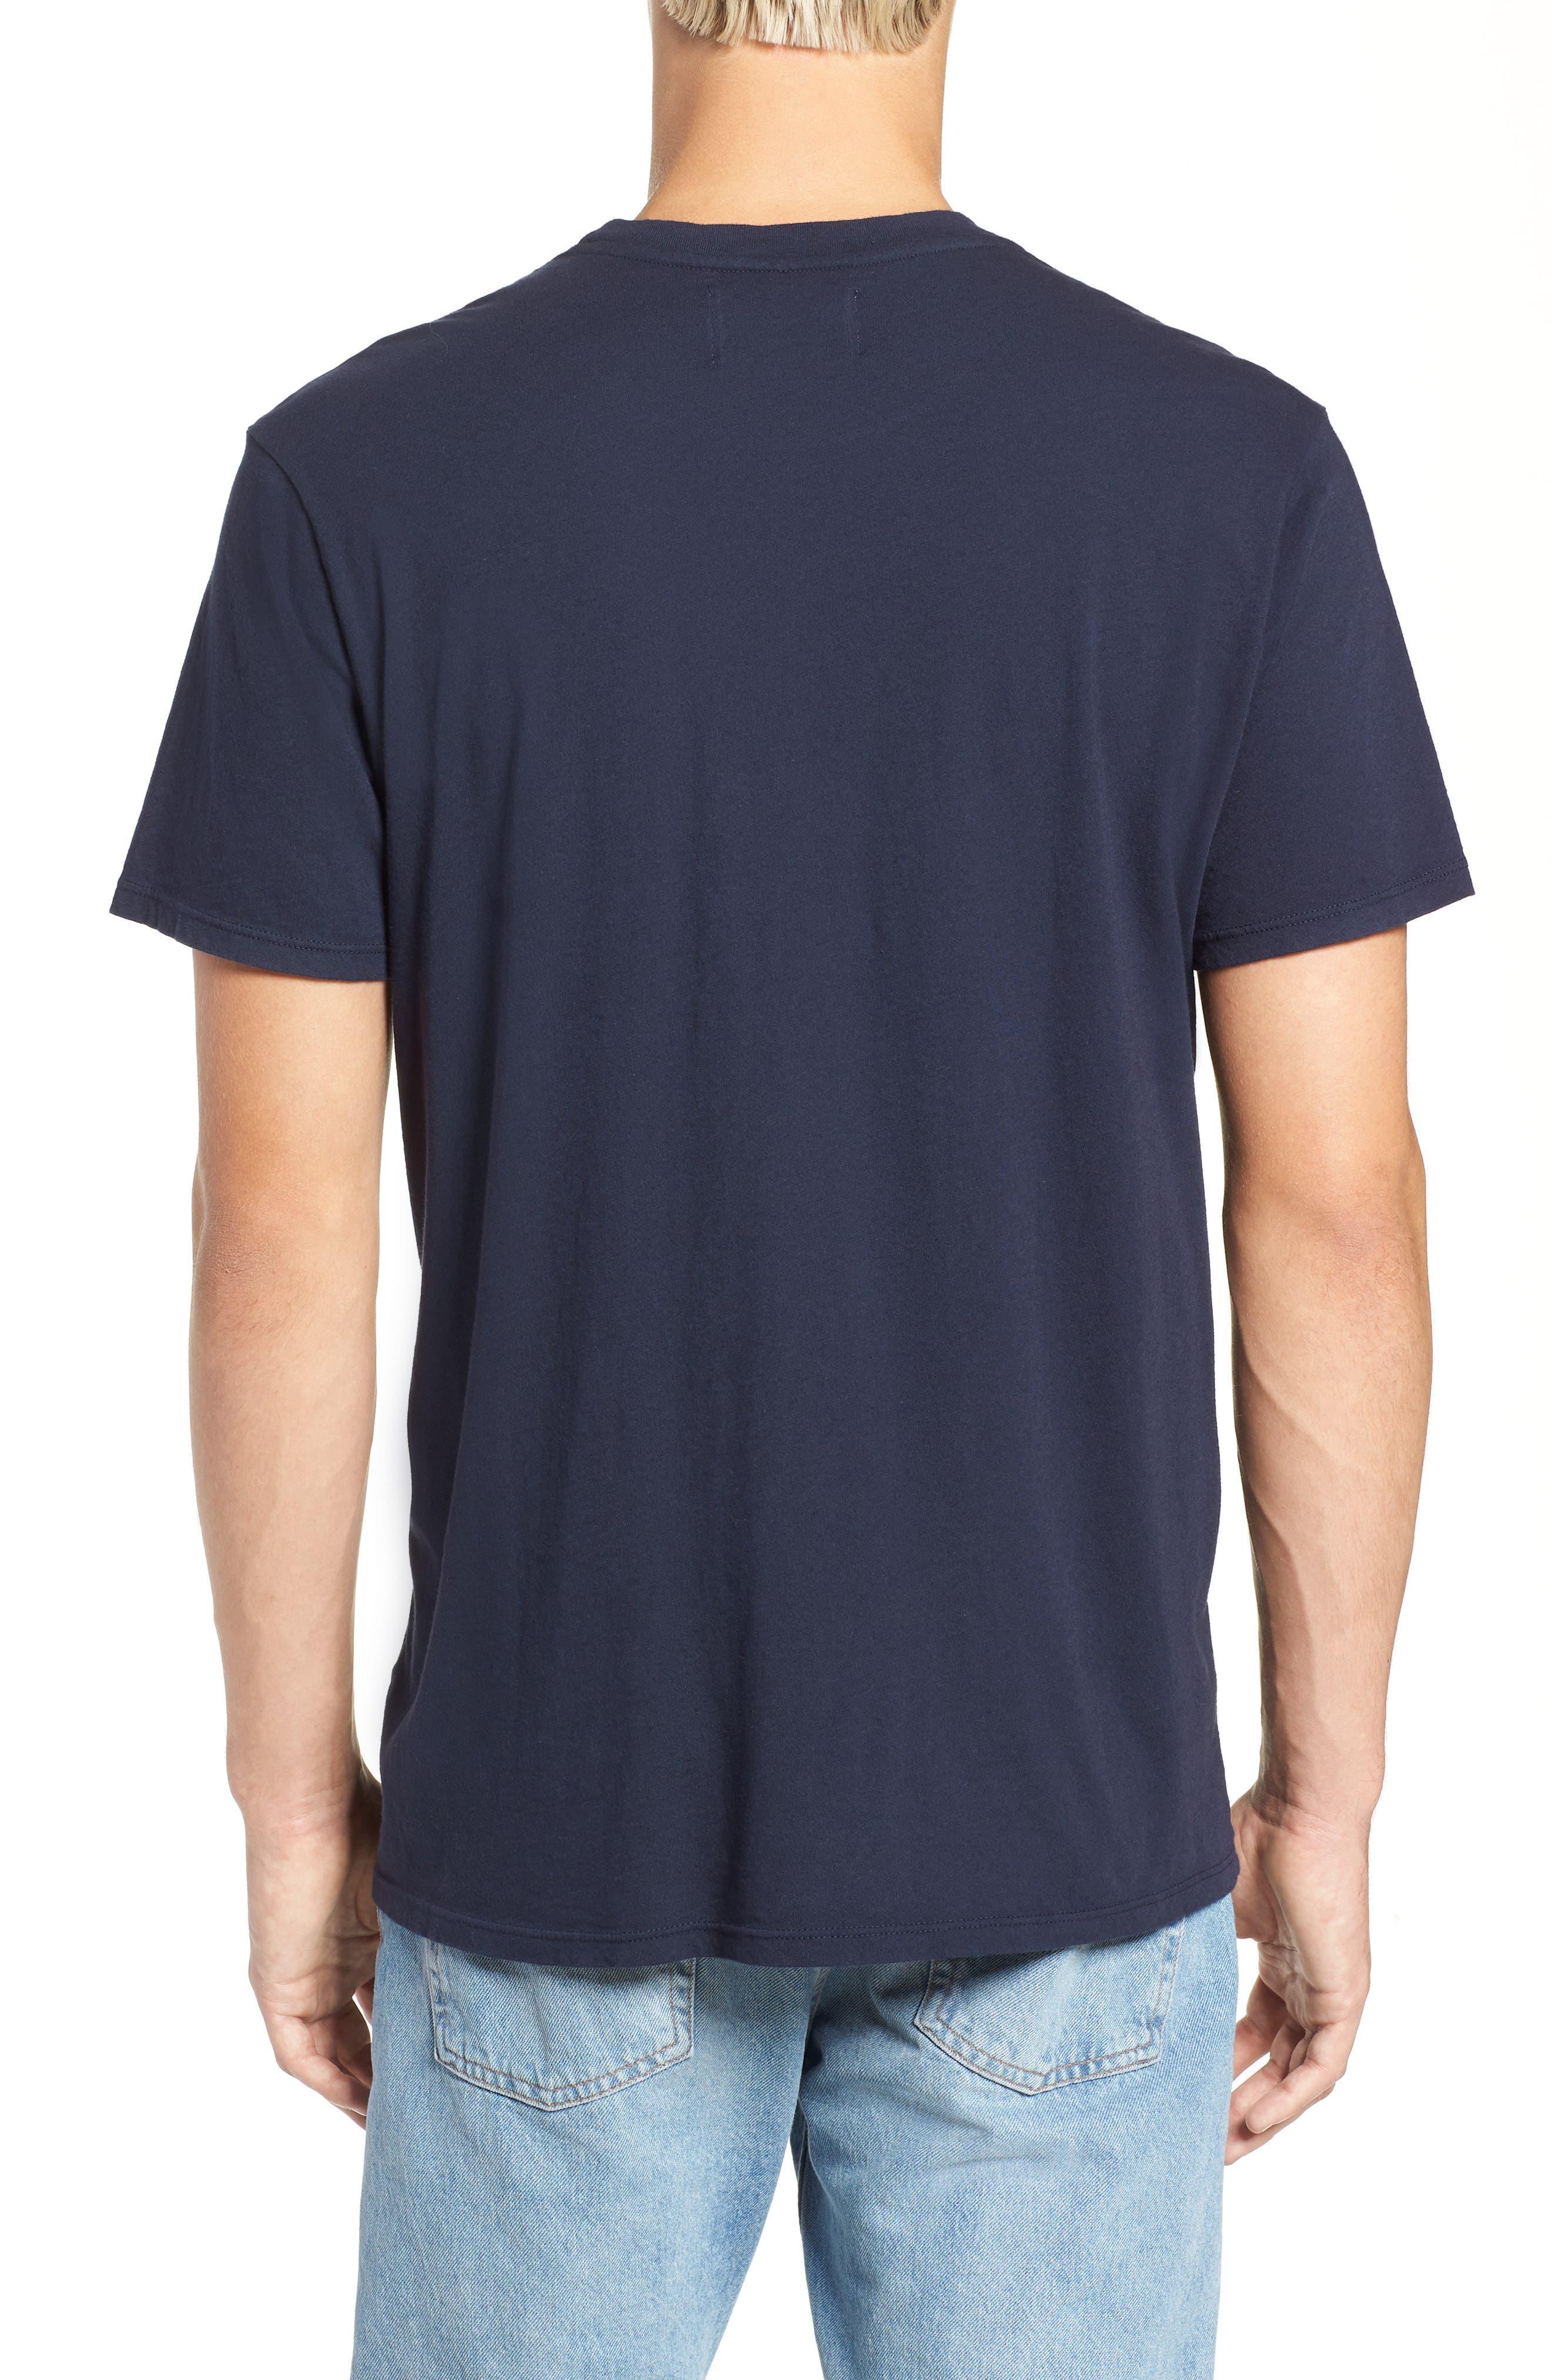 Amigo Graphic T-Shirt,                             Alternate thumbnail 2, color,                             400